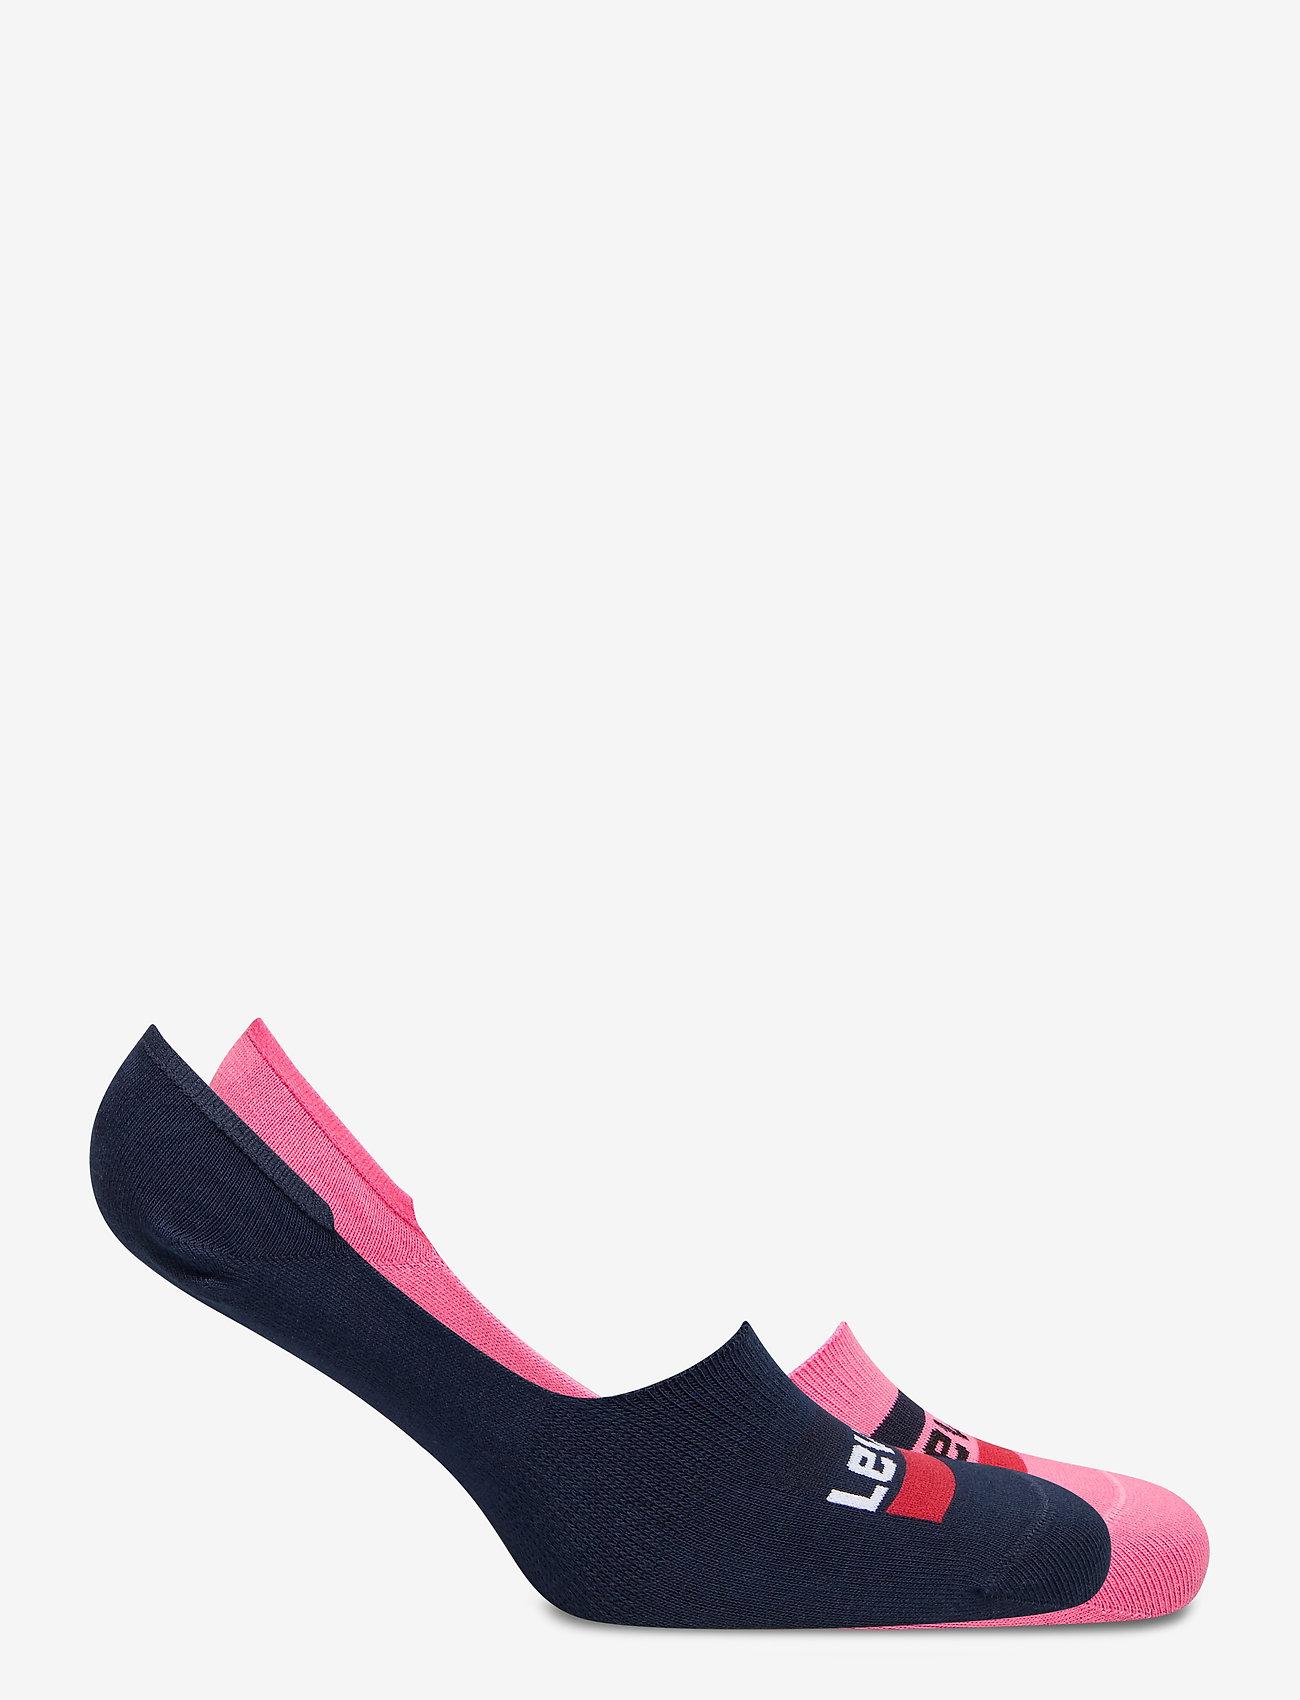 Levi´s - LEVIS LOW RISE SPORTWR LOGO 2P - korte strømper - pink combo - 1